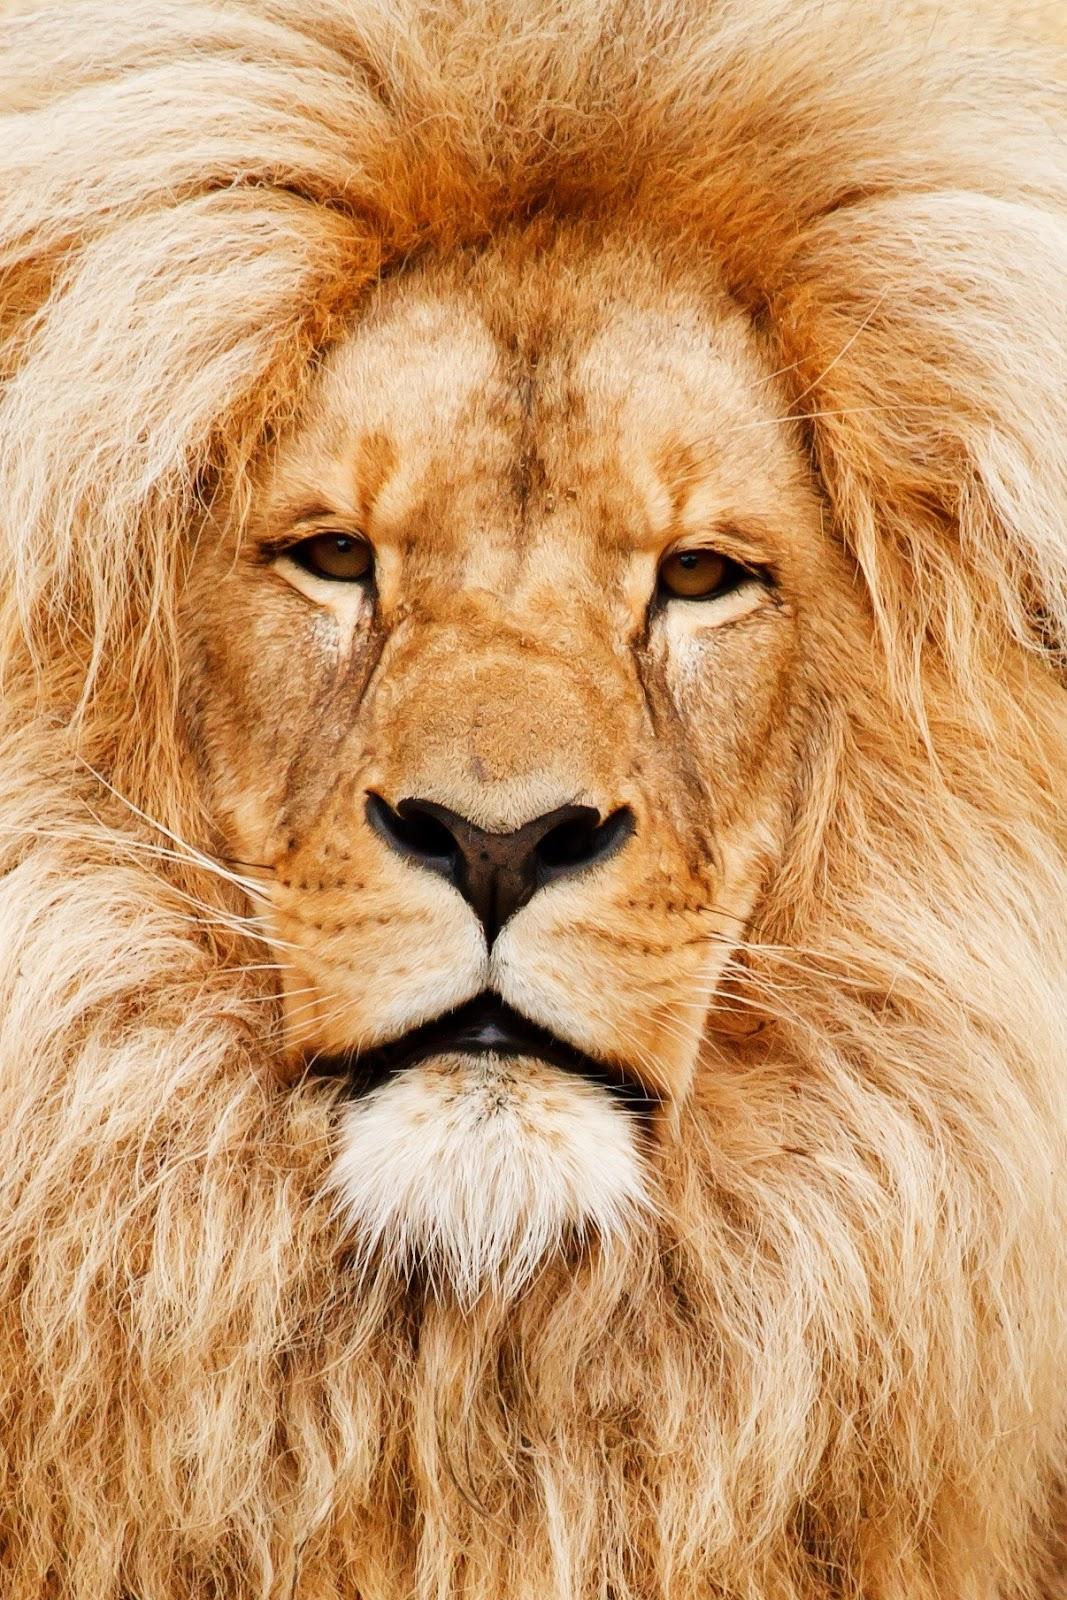 Close up photo of brown lion,lion images